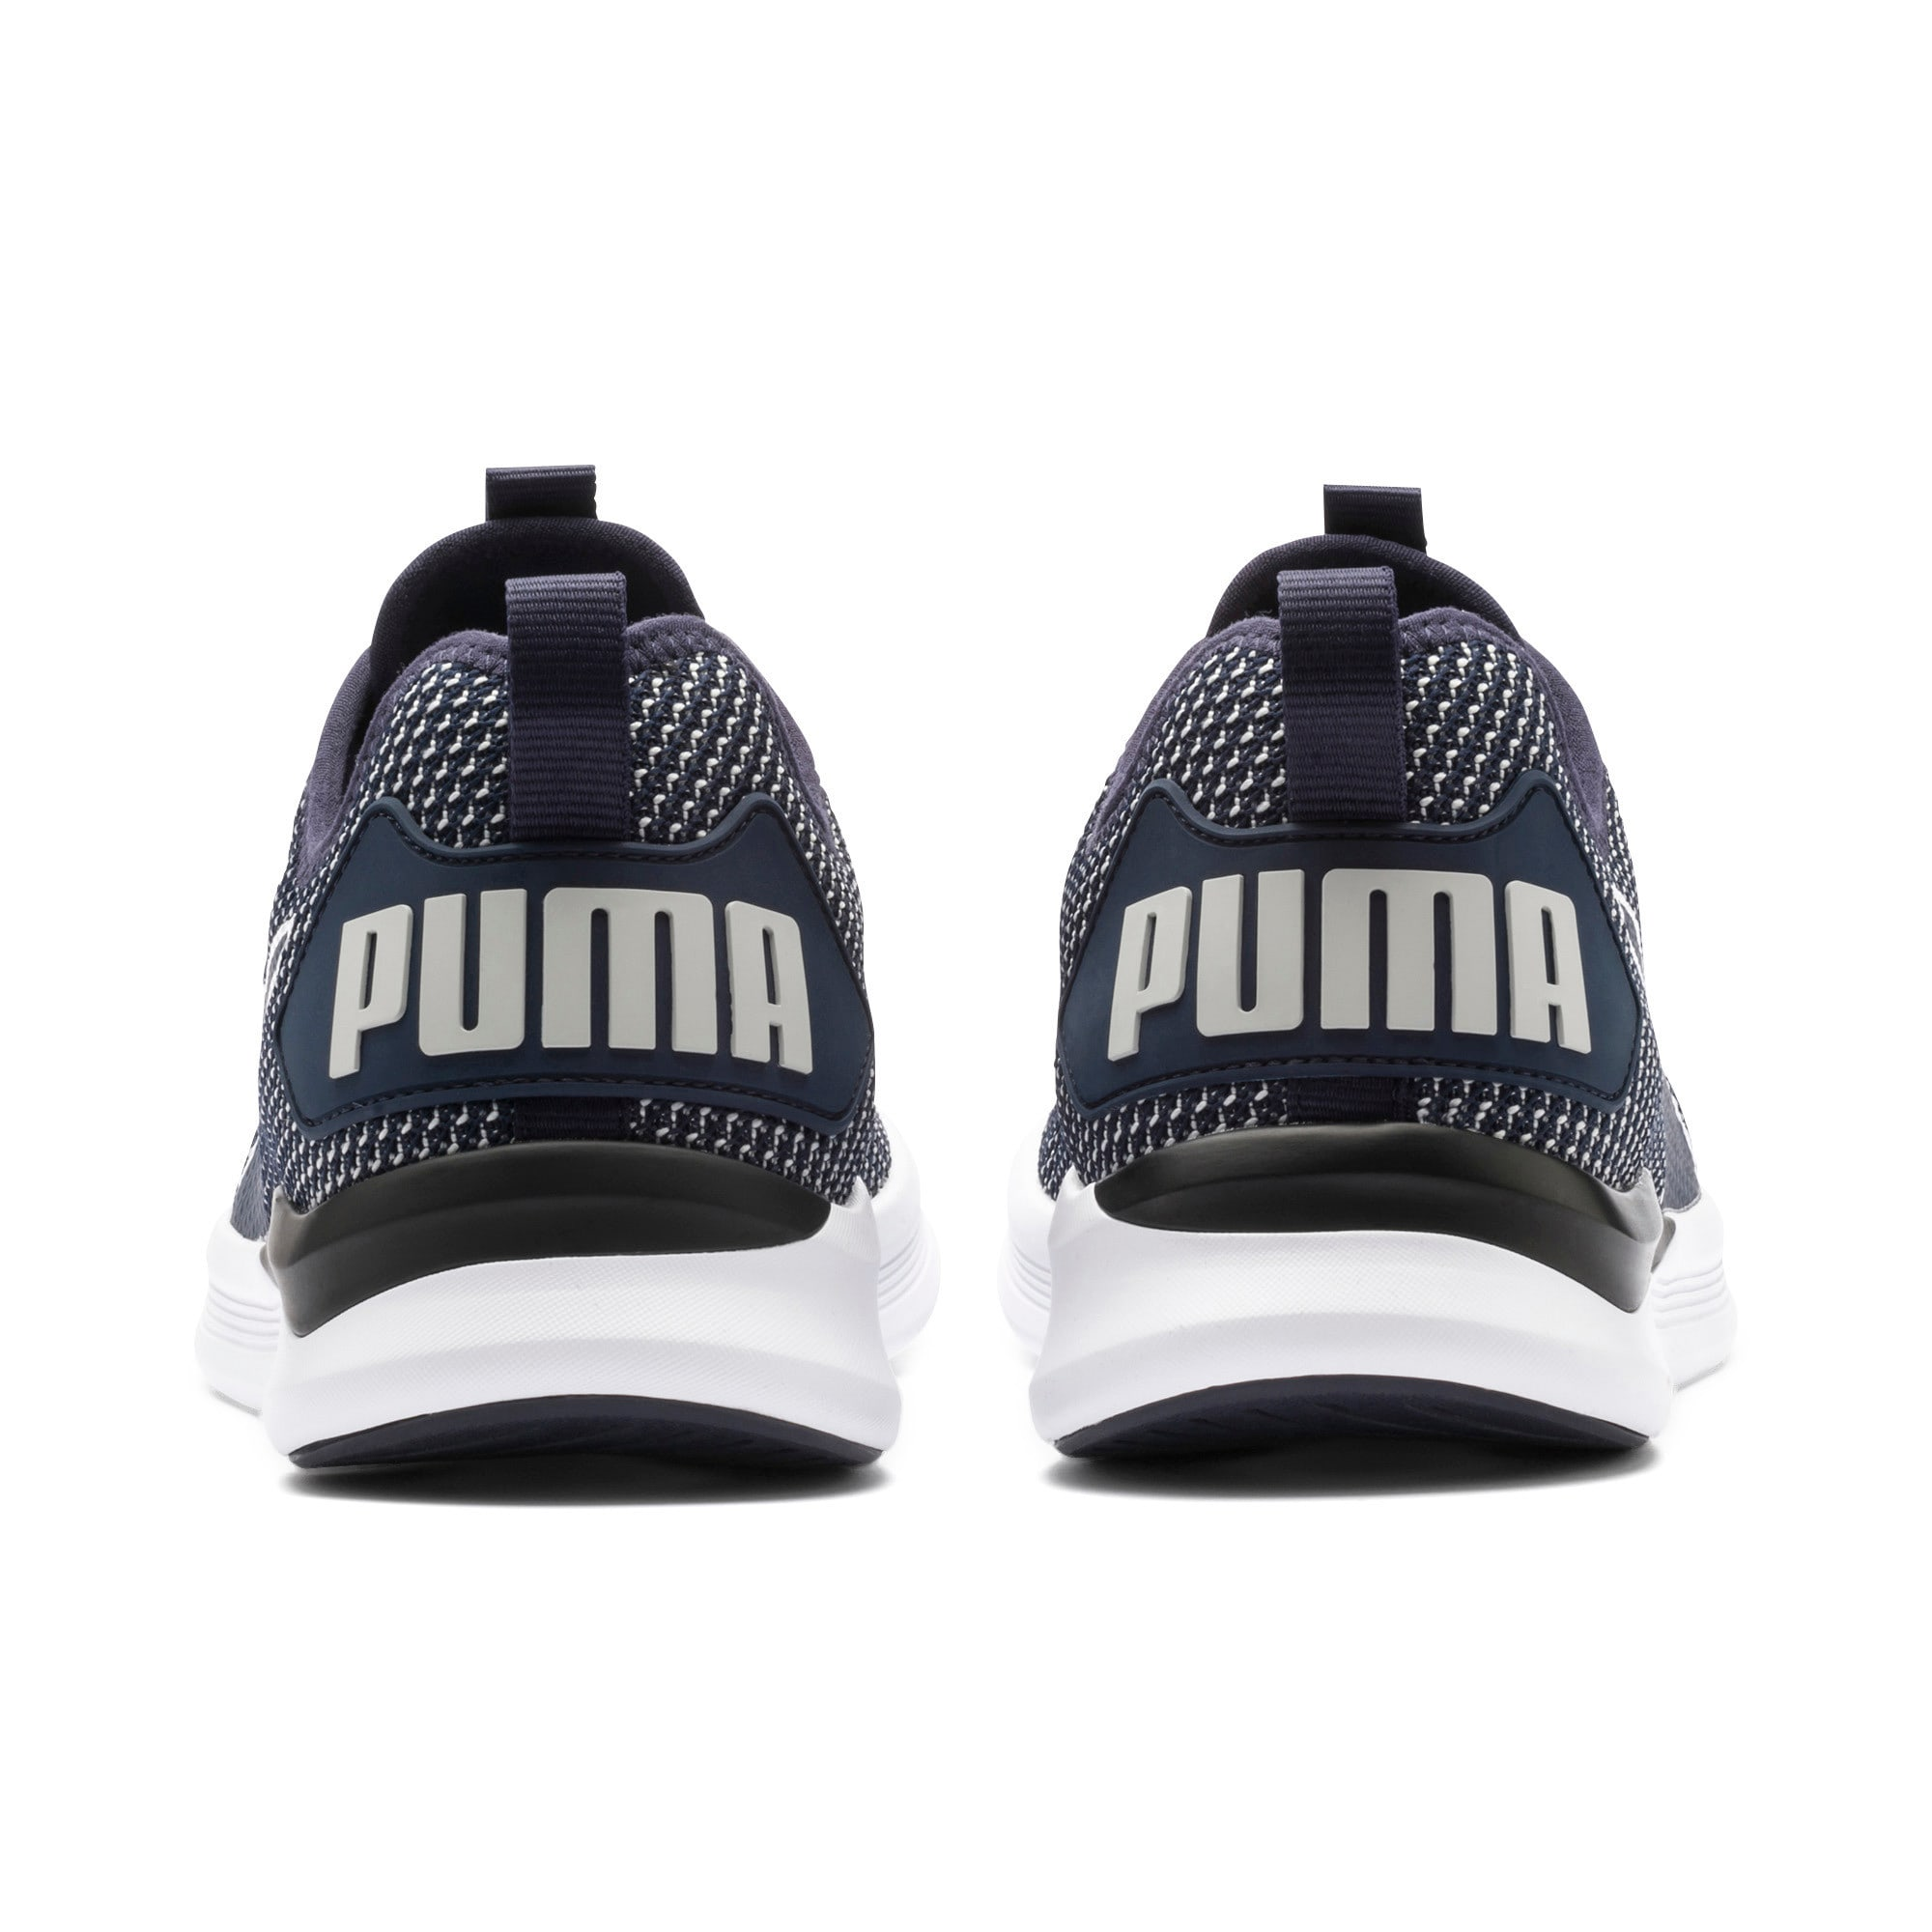 Thumbnail 5 of IGNITE Flash Men's Training Shoes, Peacoat-Glacier Gray-White, medium